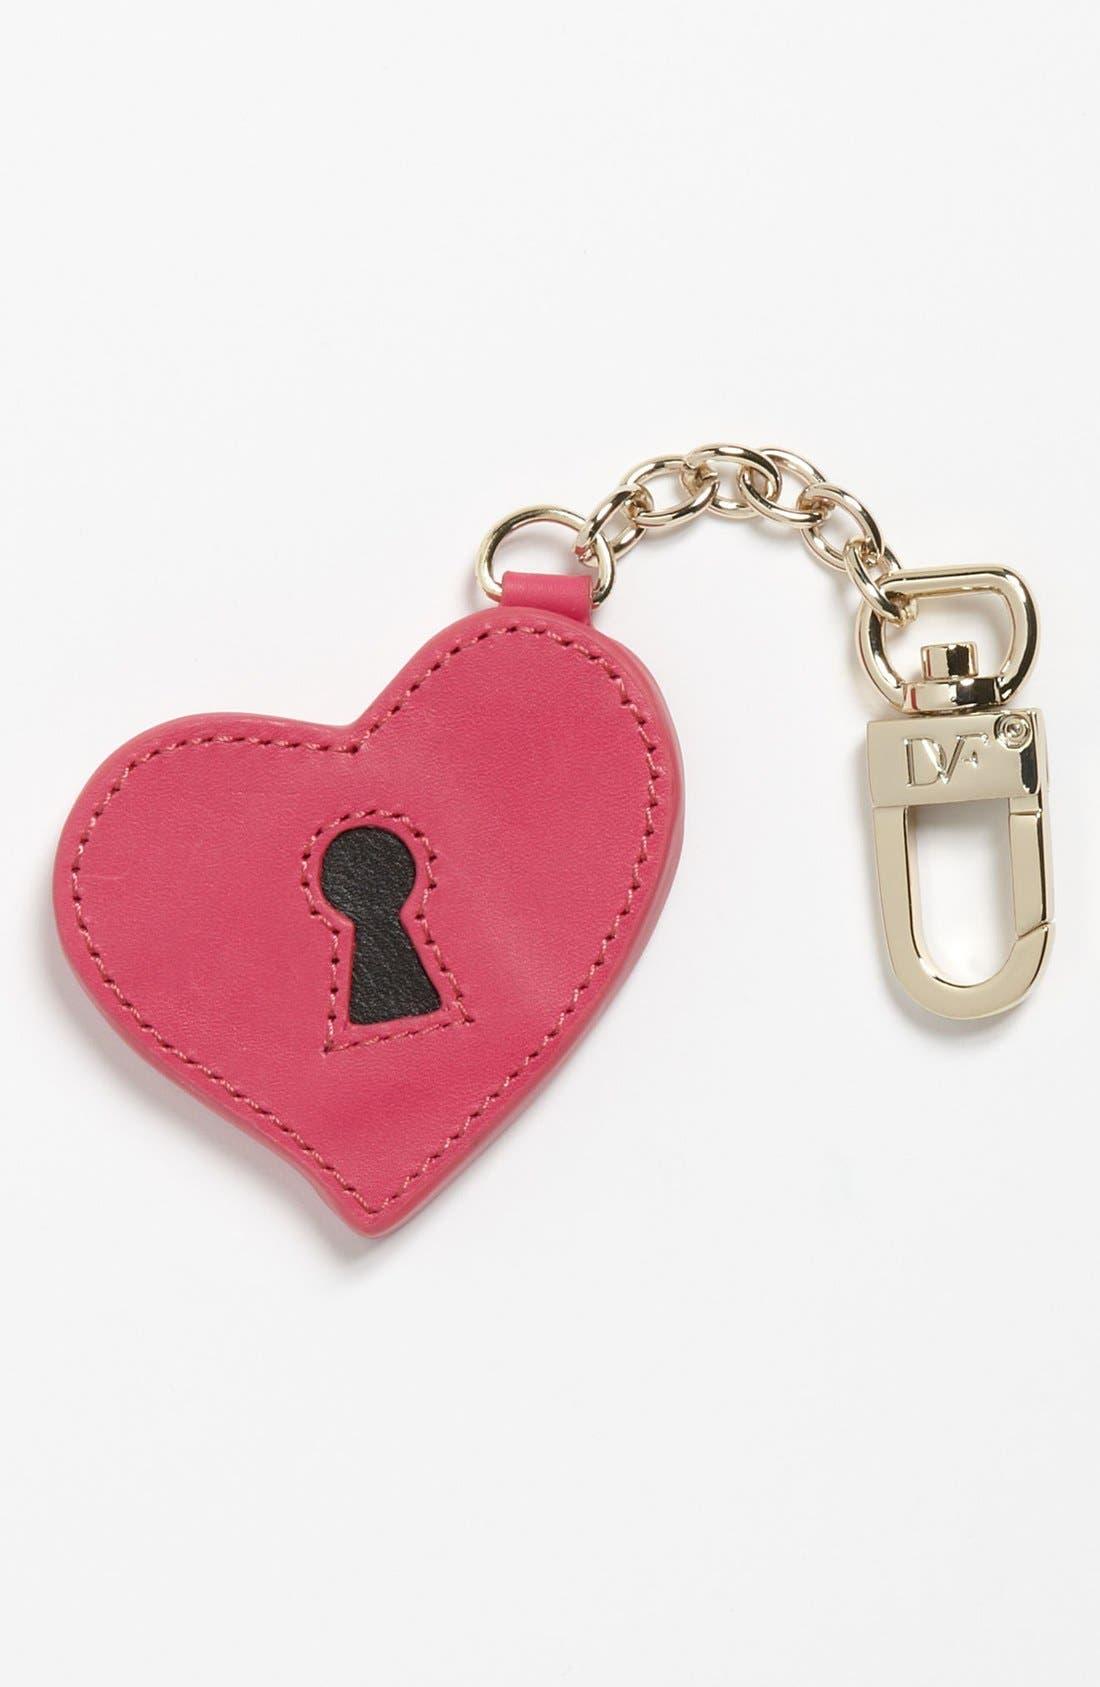 Main Image - Diane von Furstenberg 'Heart' Key Ring